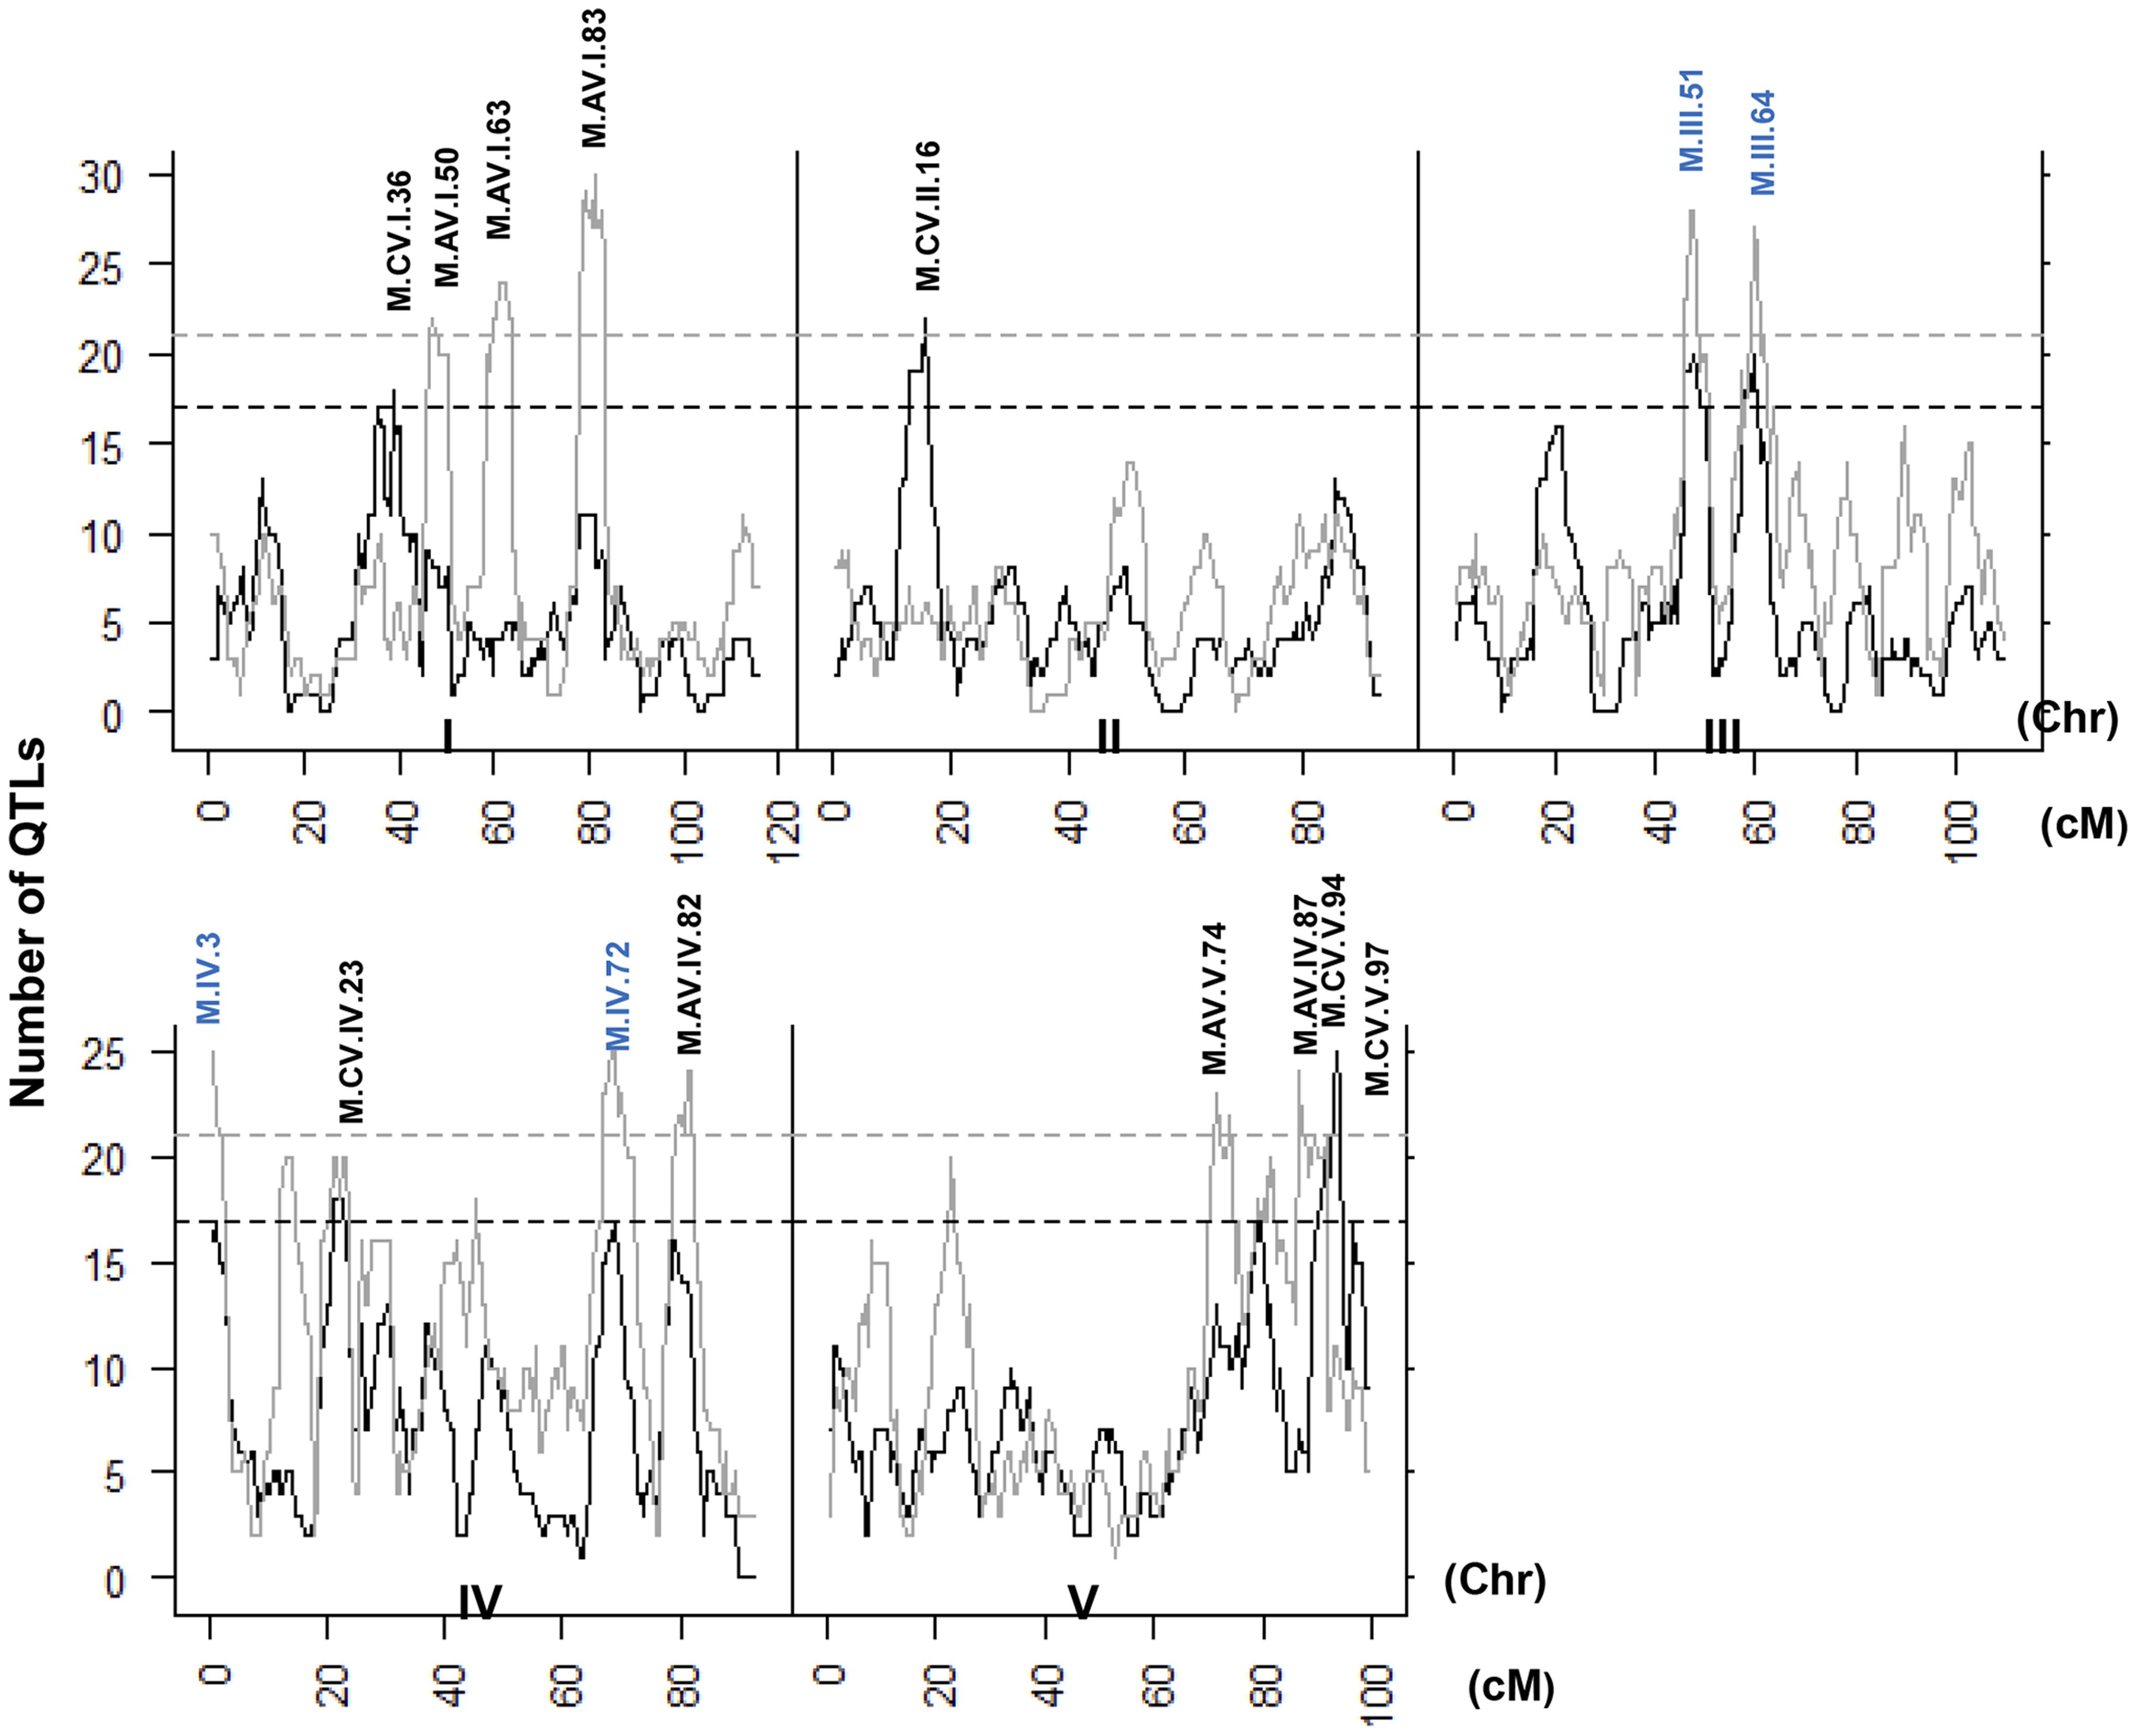 QTL hotspots for metabolite average and CV.